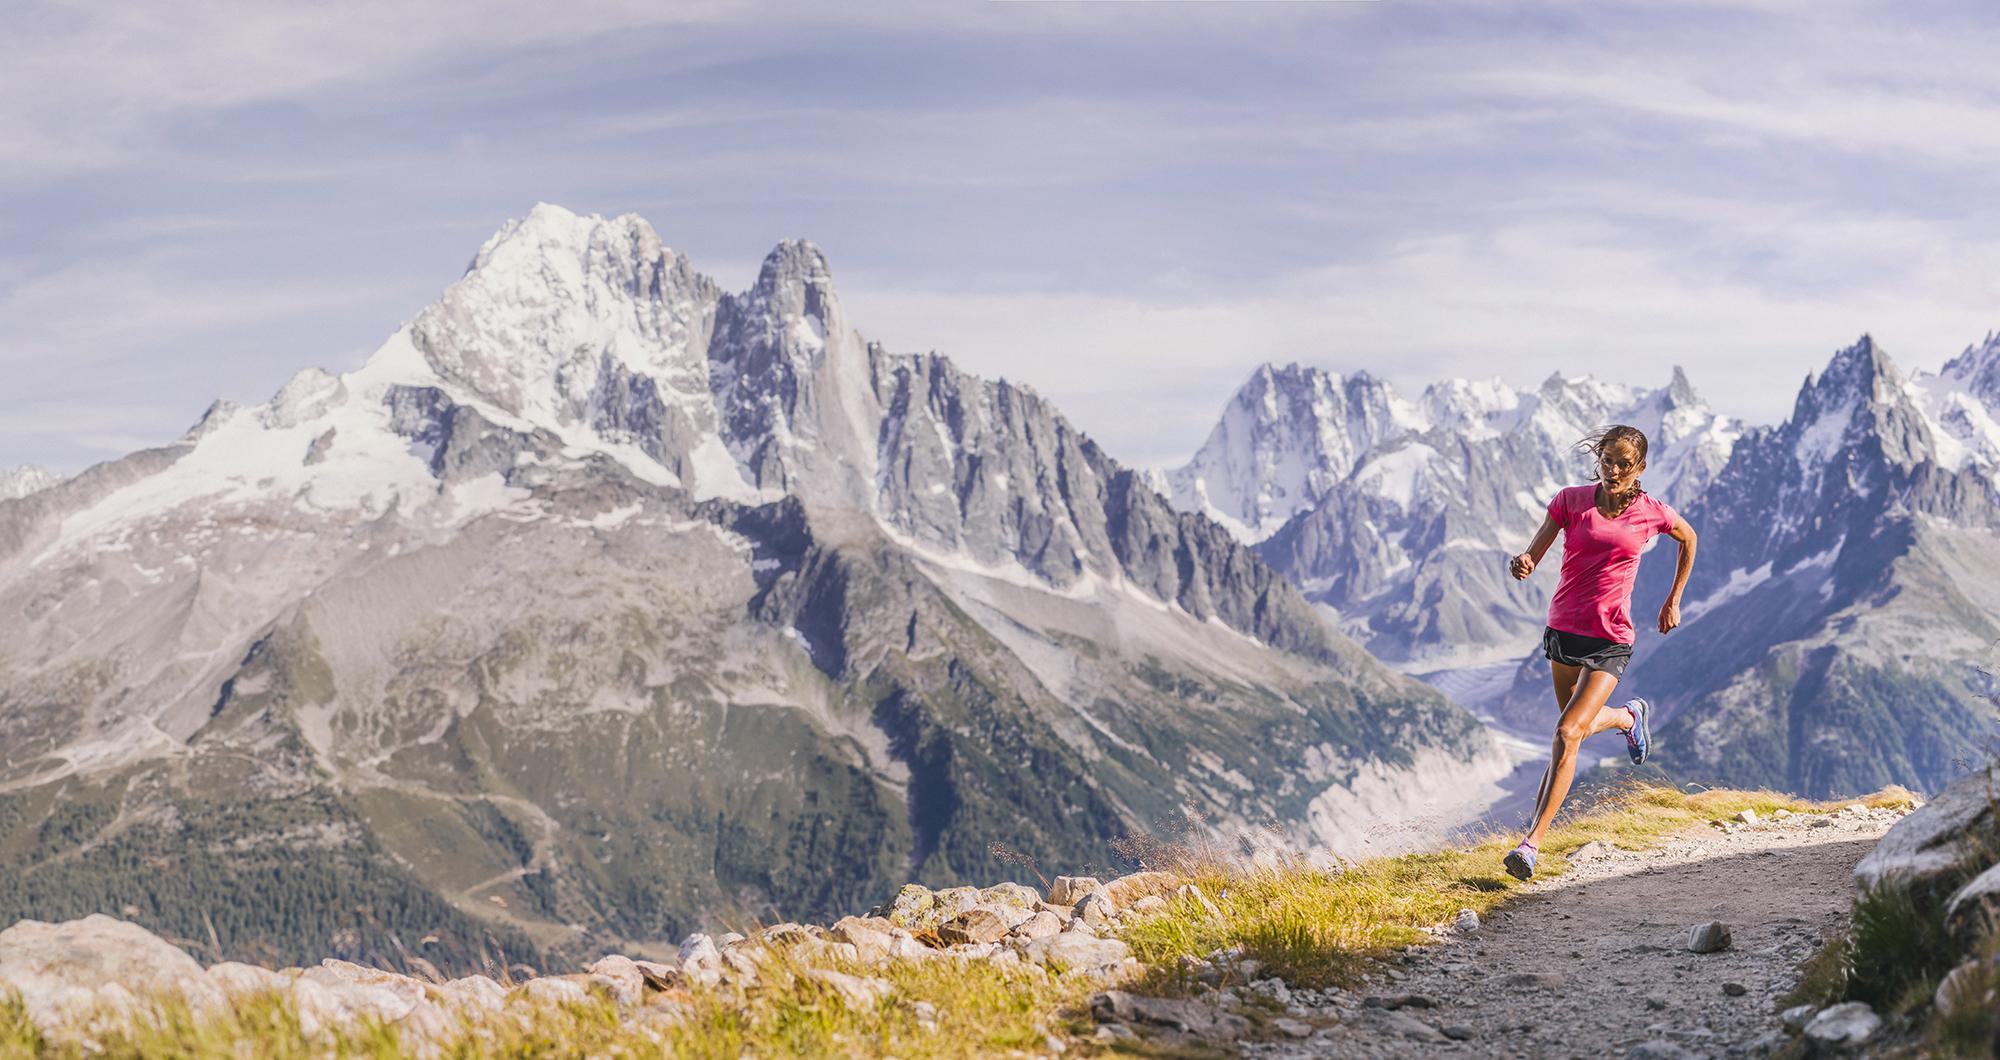 Rory Bosio. Chamonix, France. Photography by Tim Kemple.